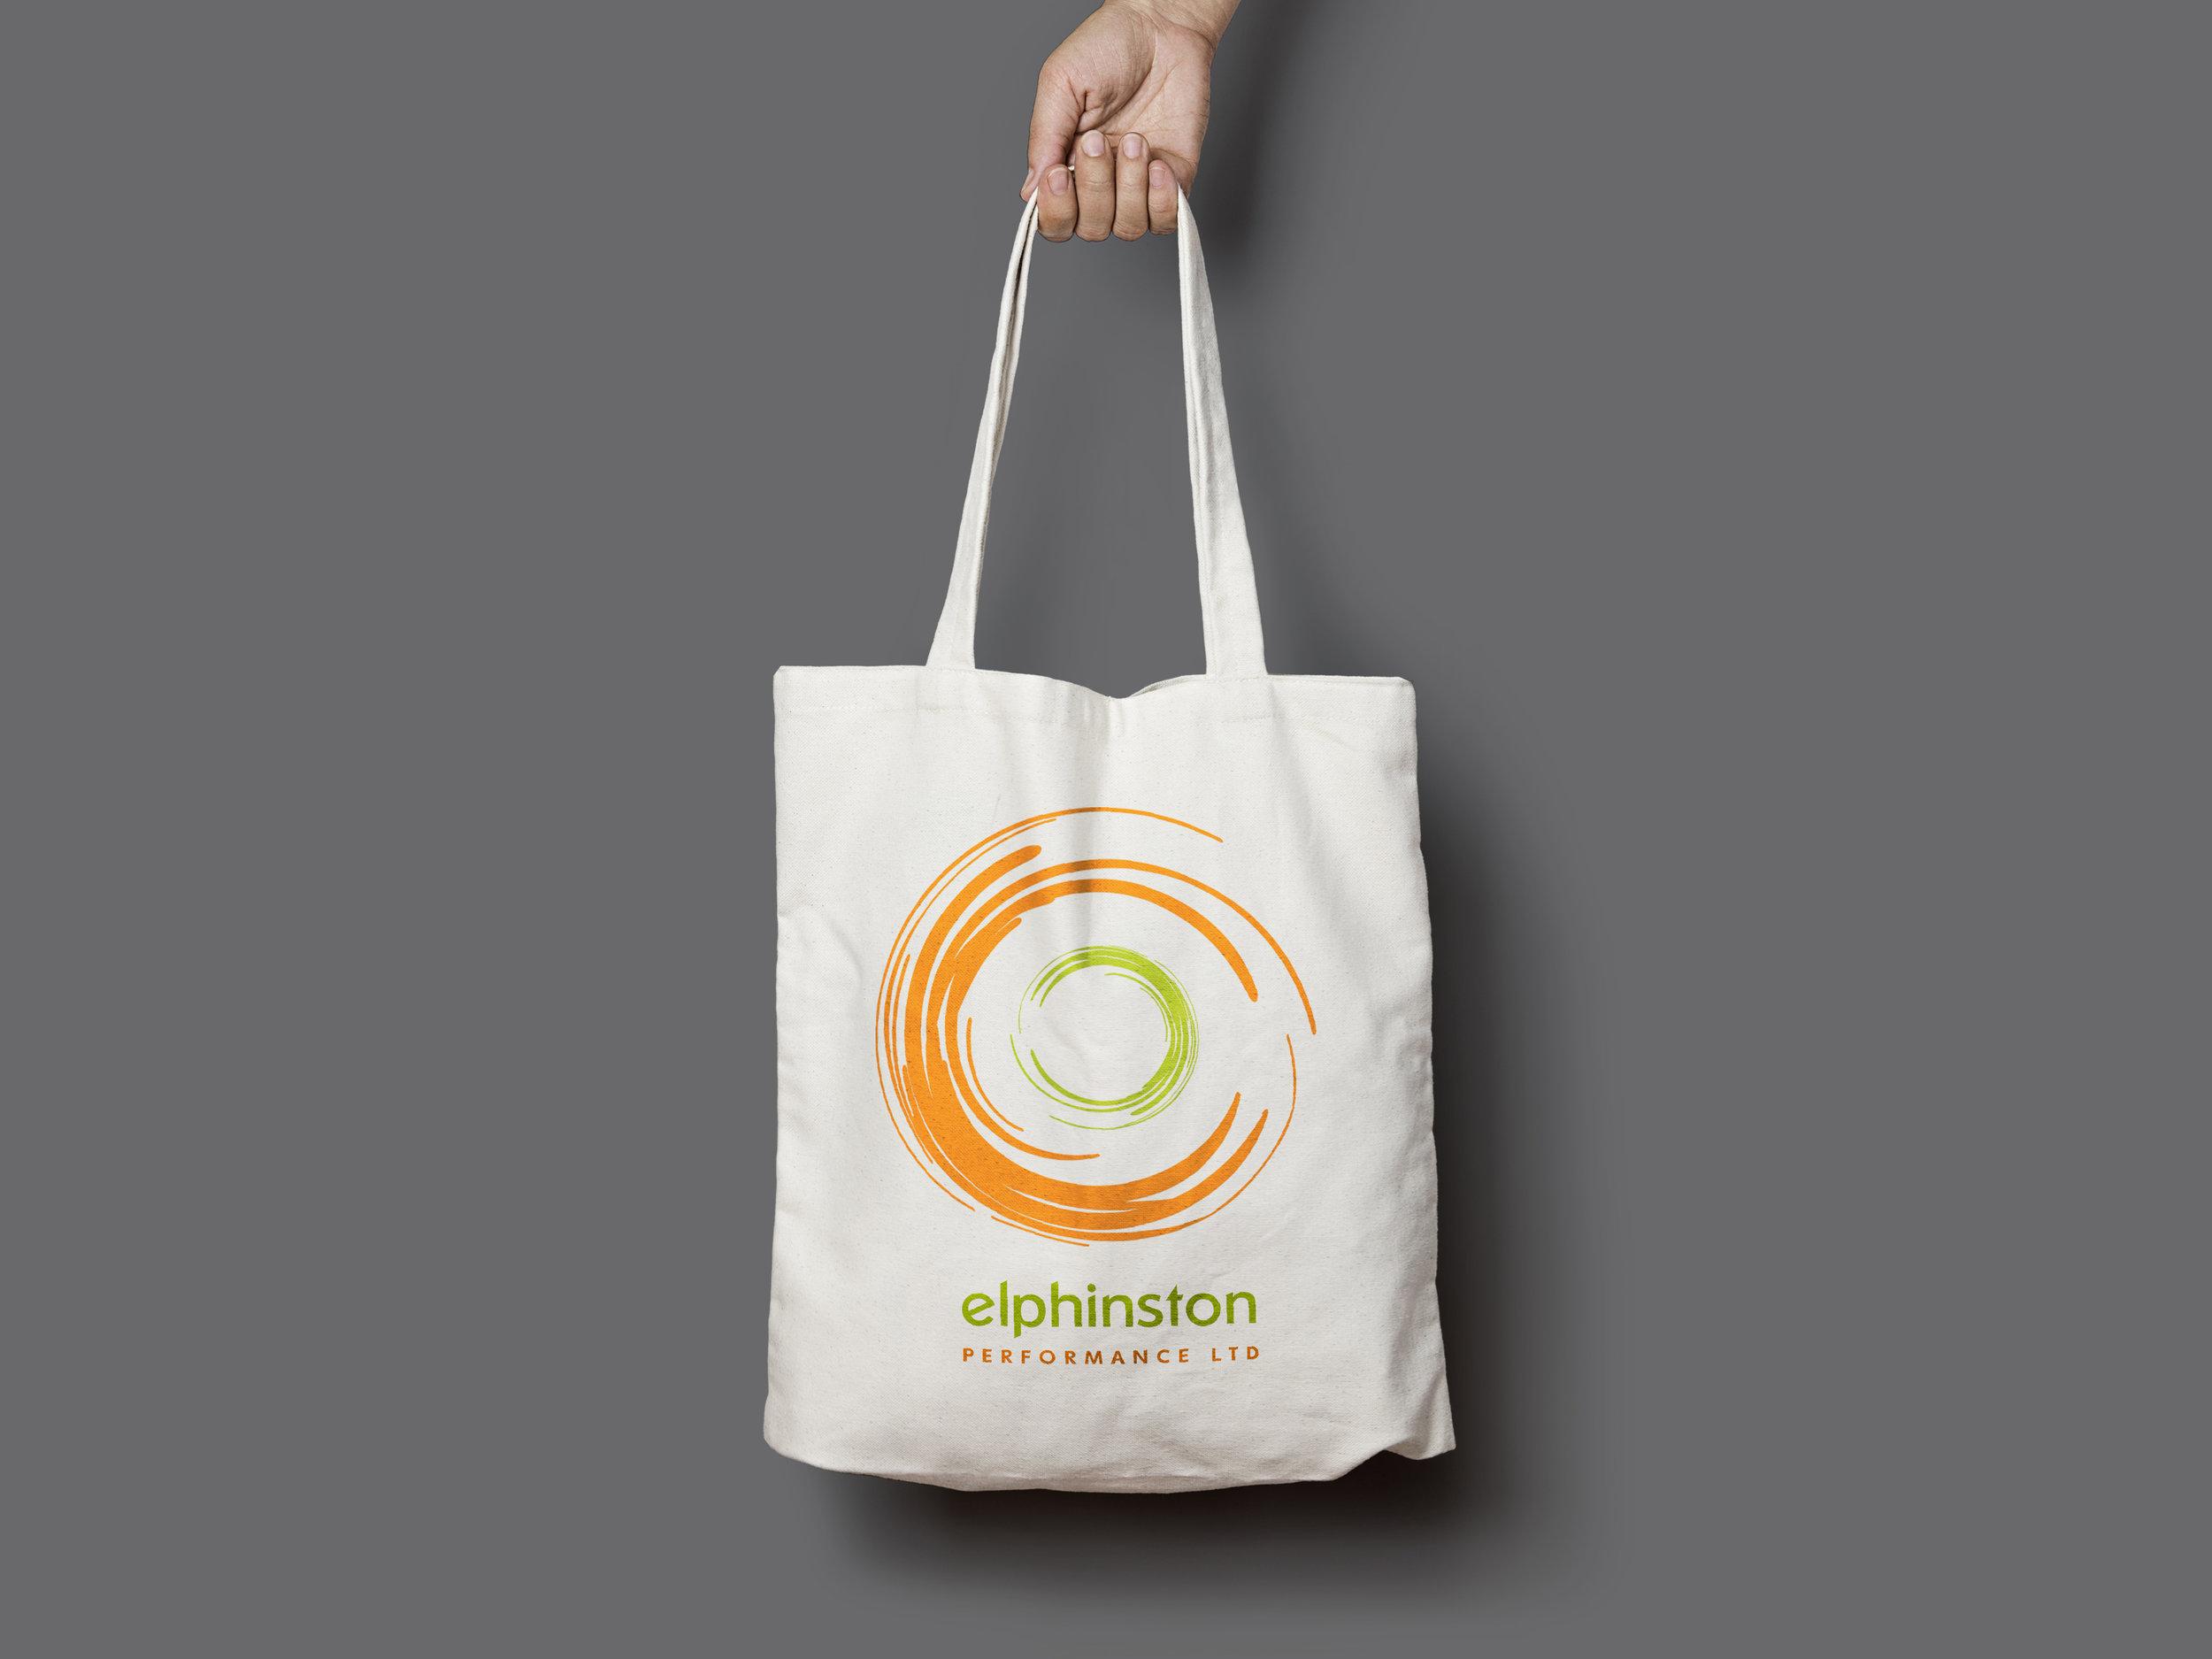 Elphinston-Performance-Tote-Bag.JPG